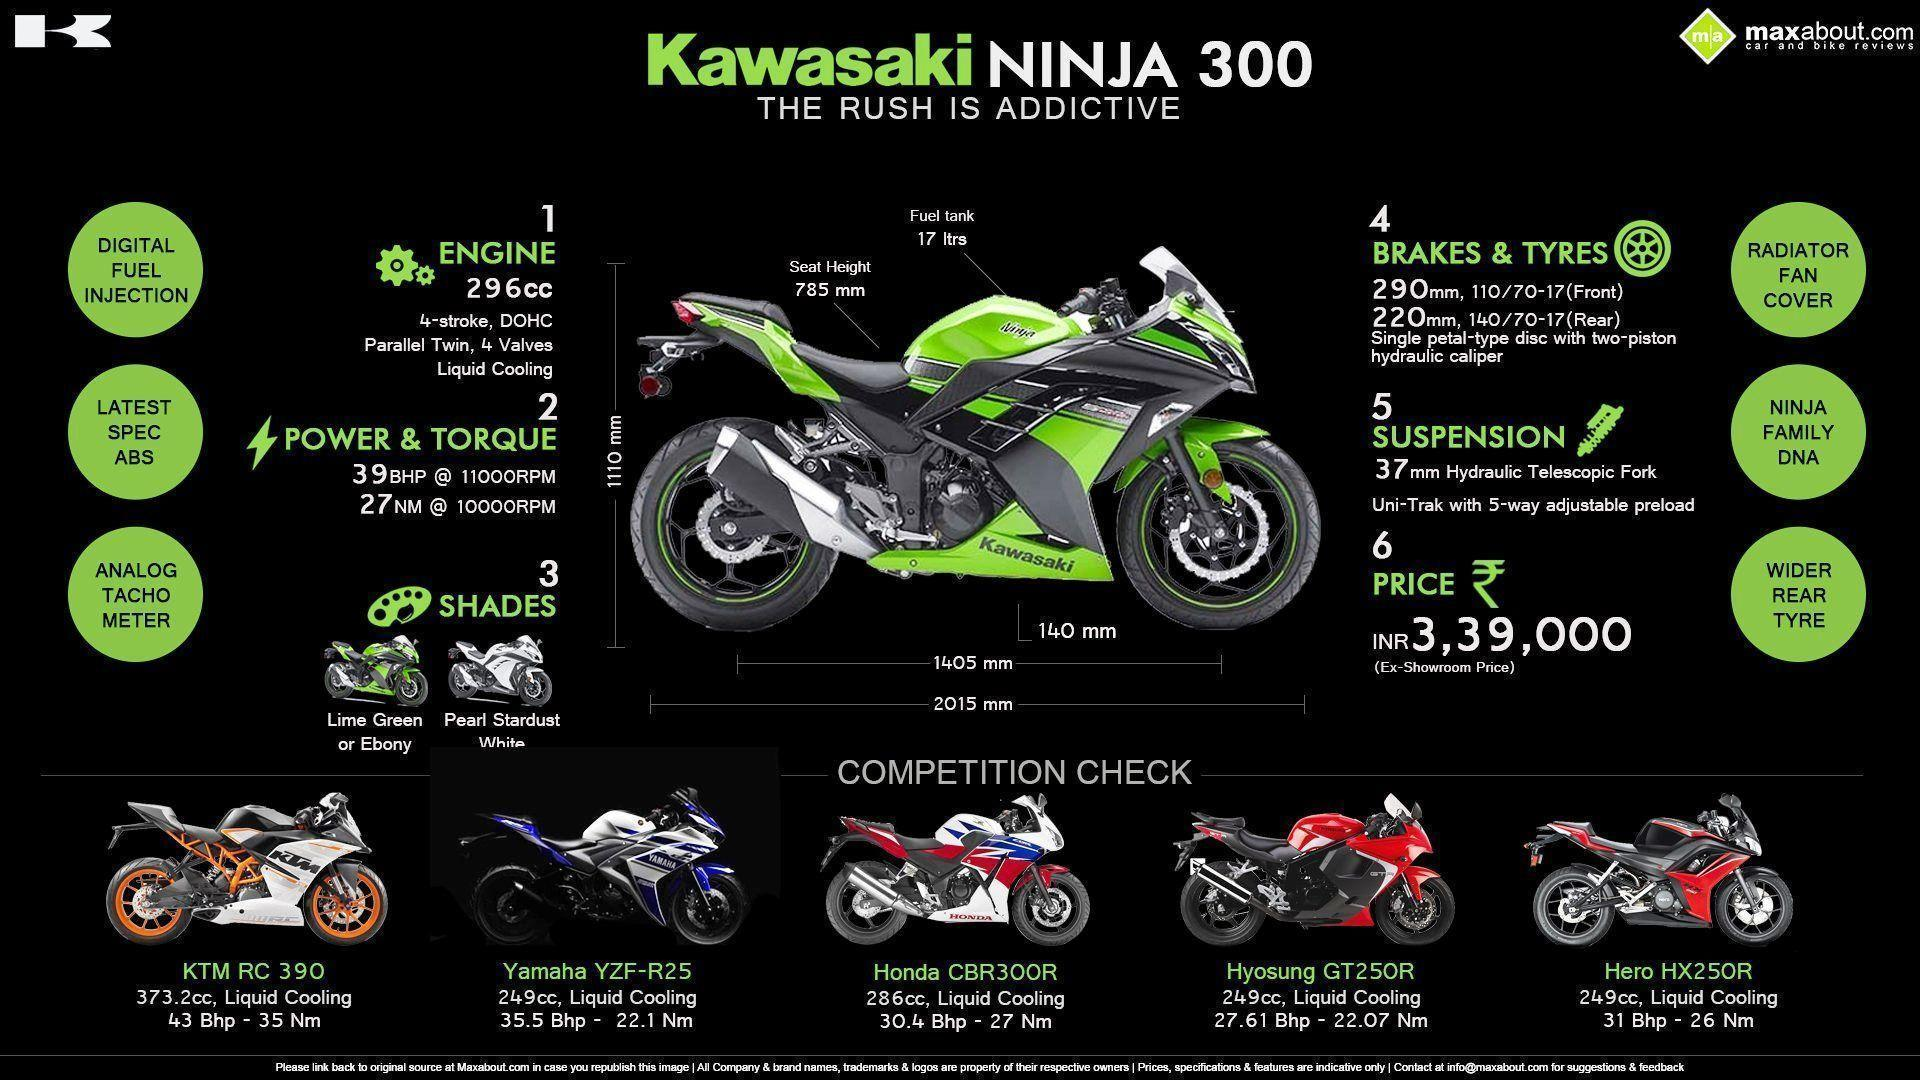 Kawasaki Ninja 300 Wallpapers - Wallpaper Cave